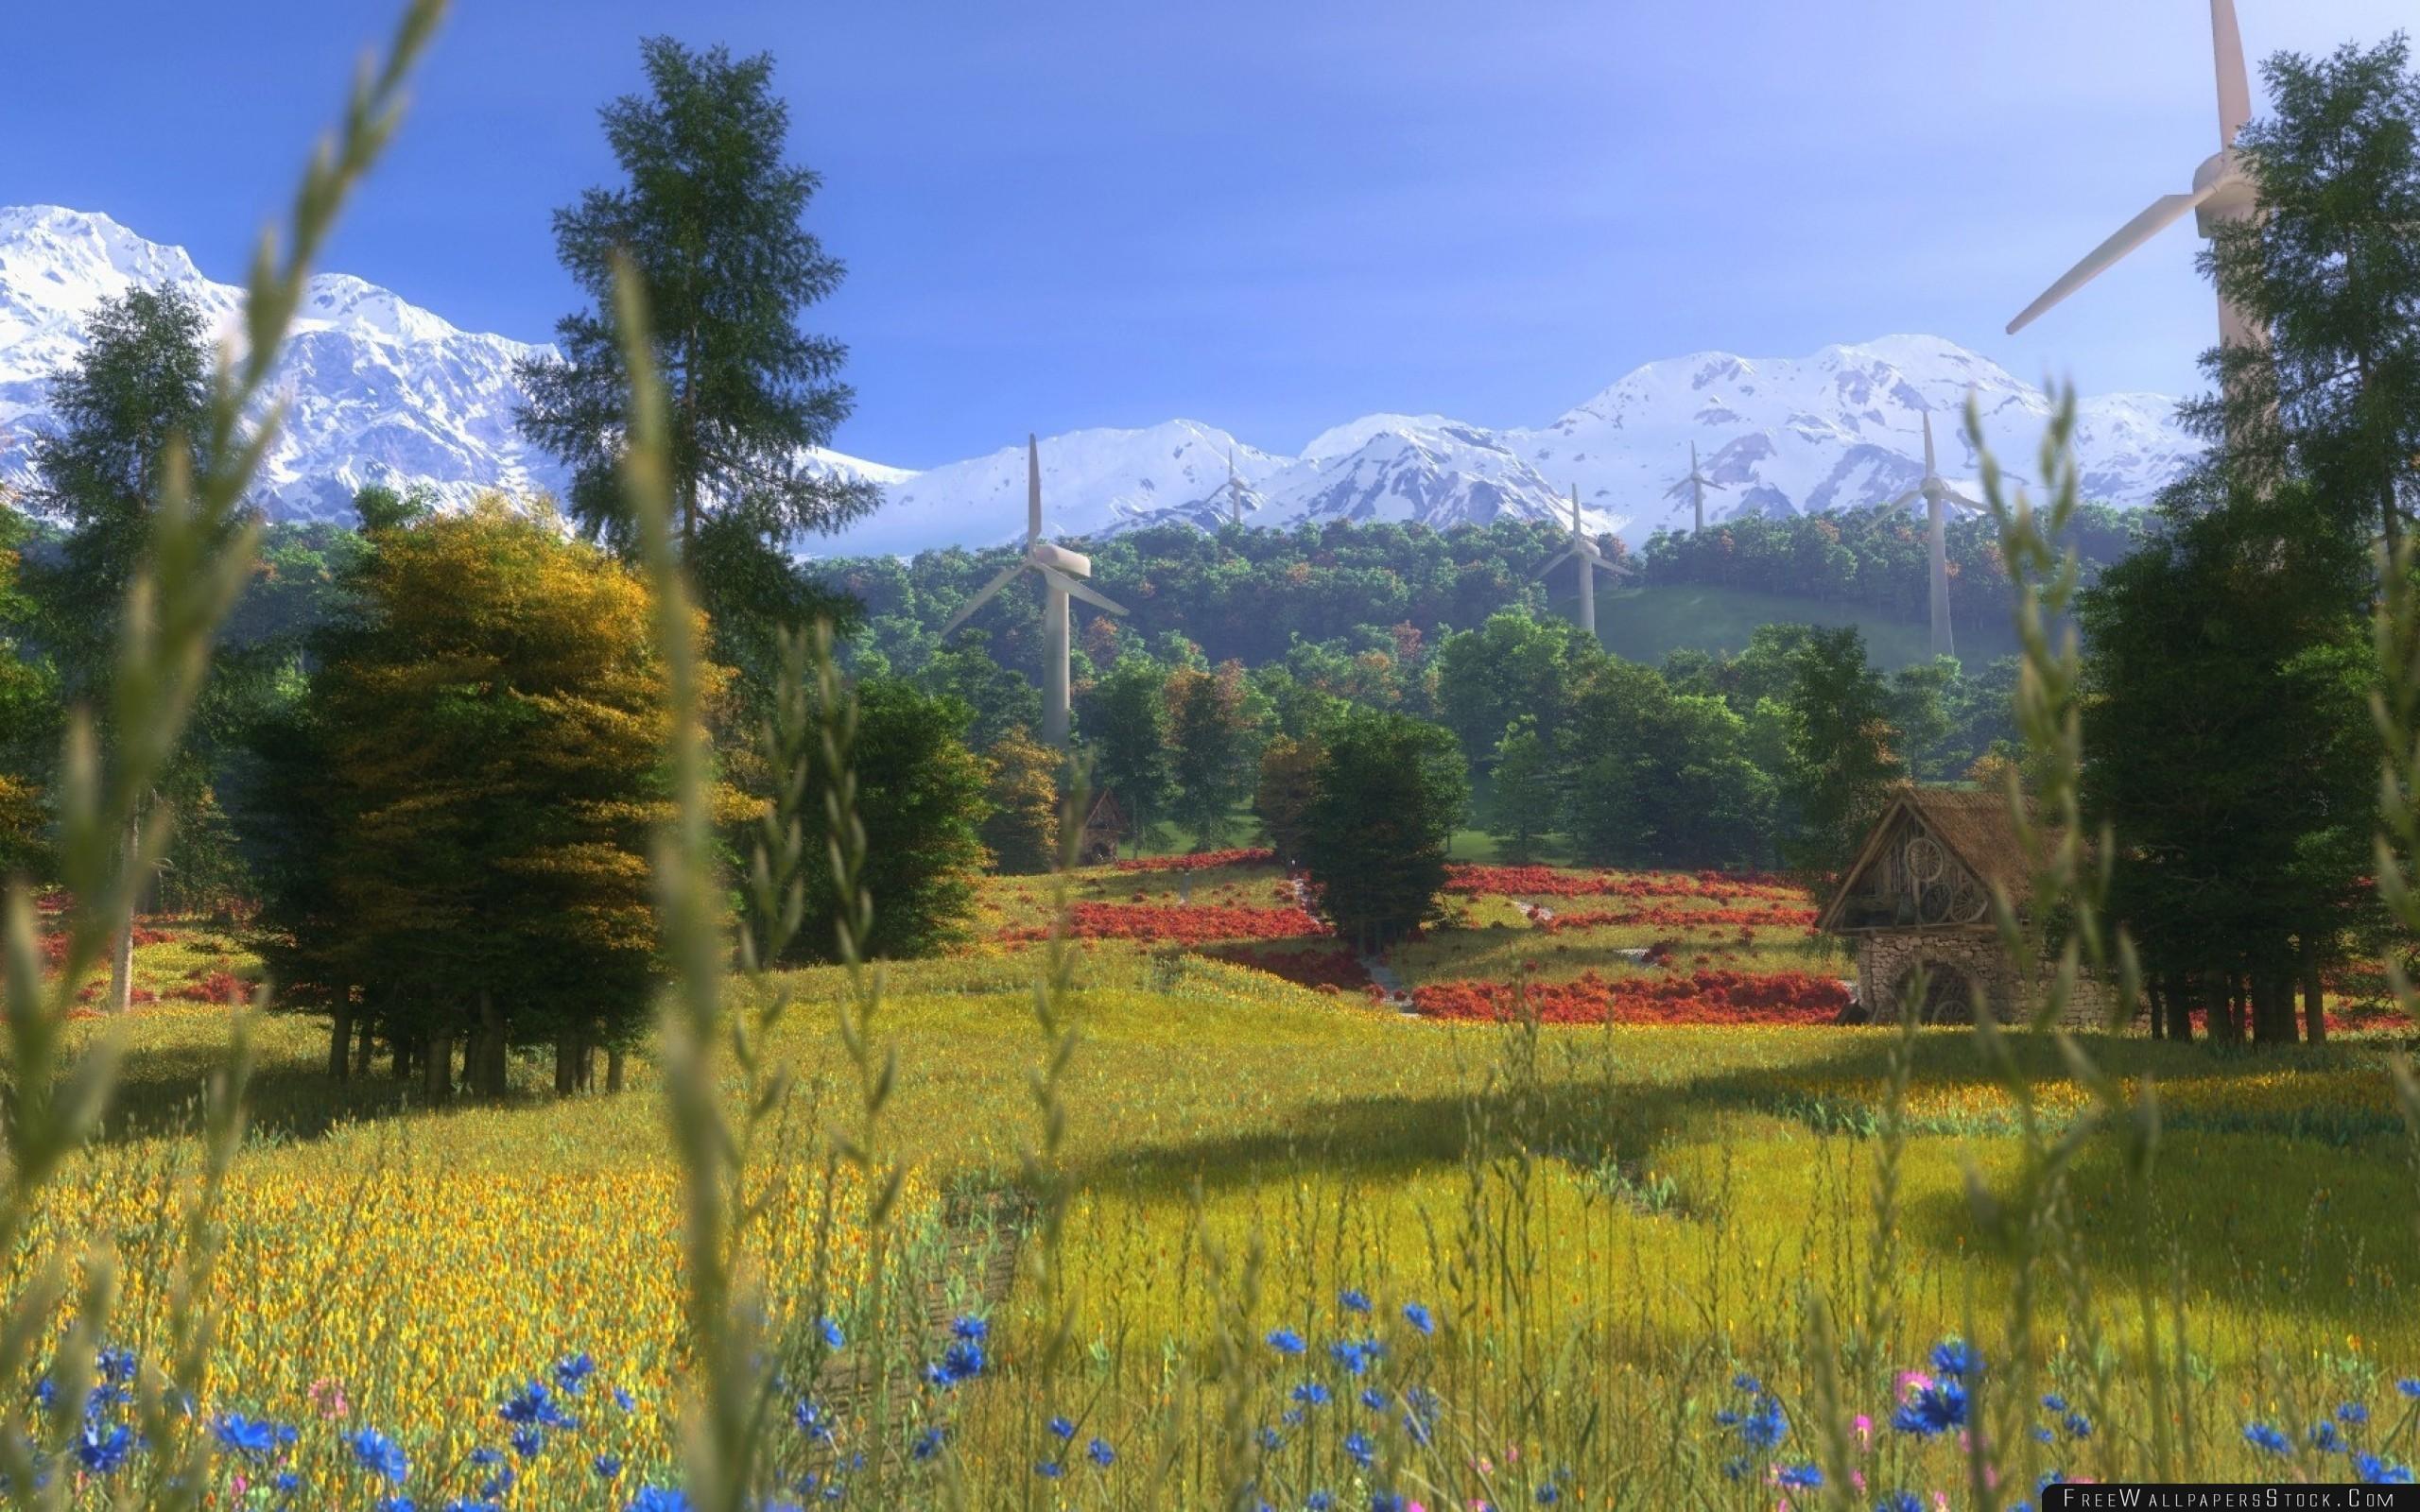 Download Free Wallpaper Windmills Flowers Trees Grass Art Home Summer Mountains